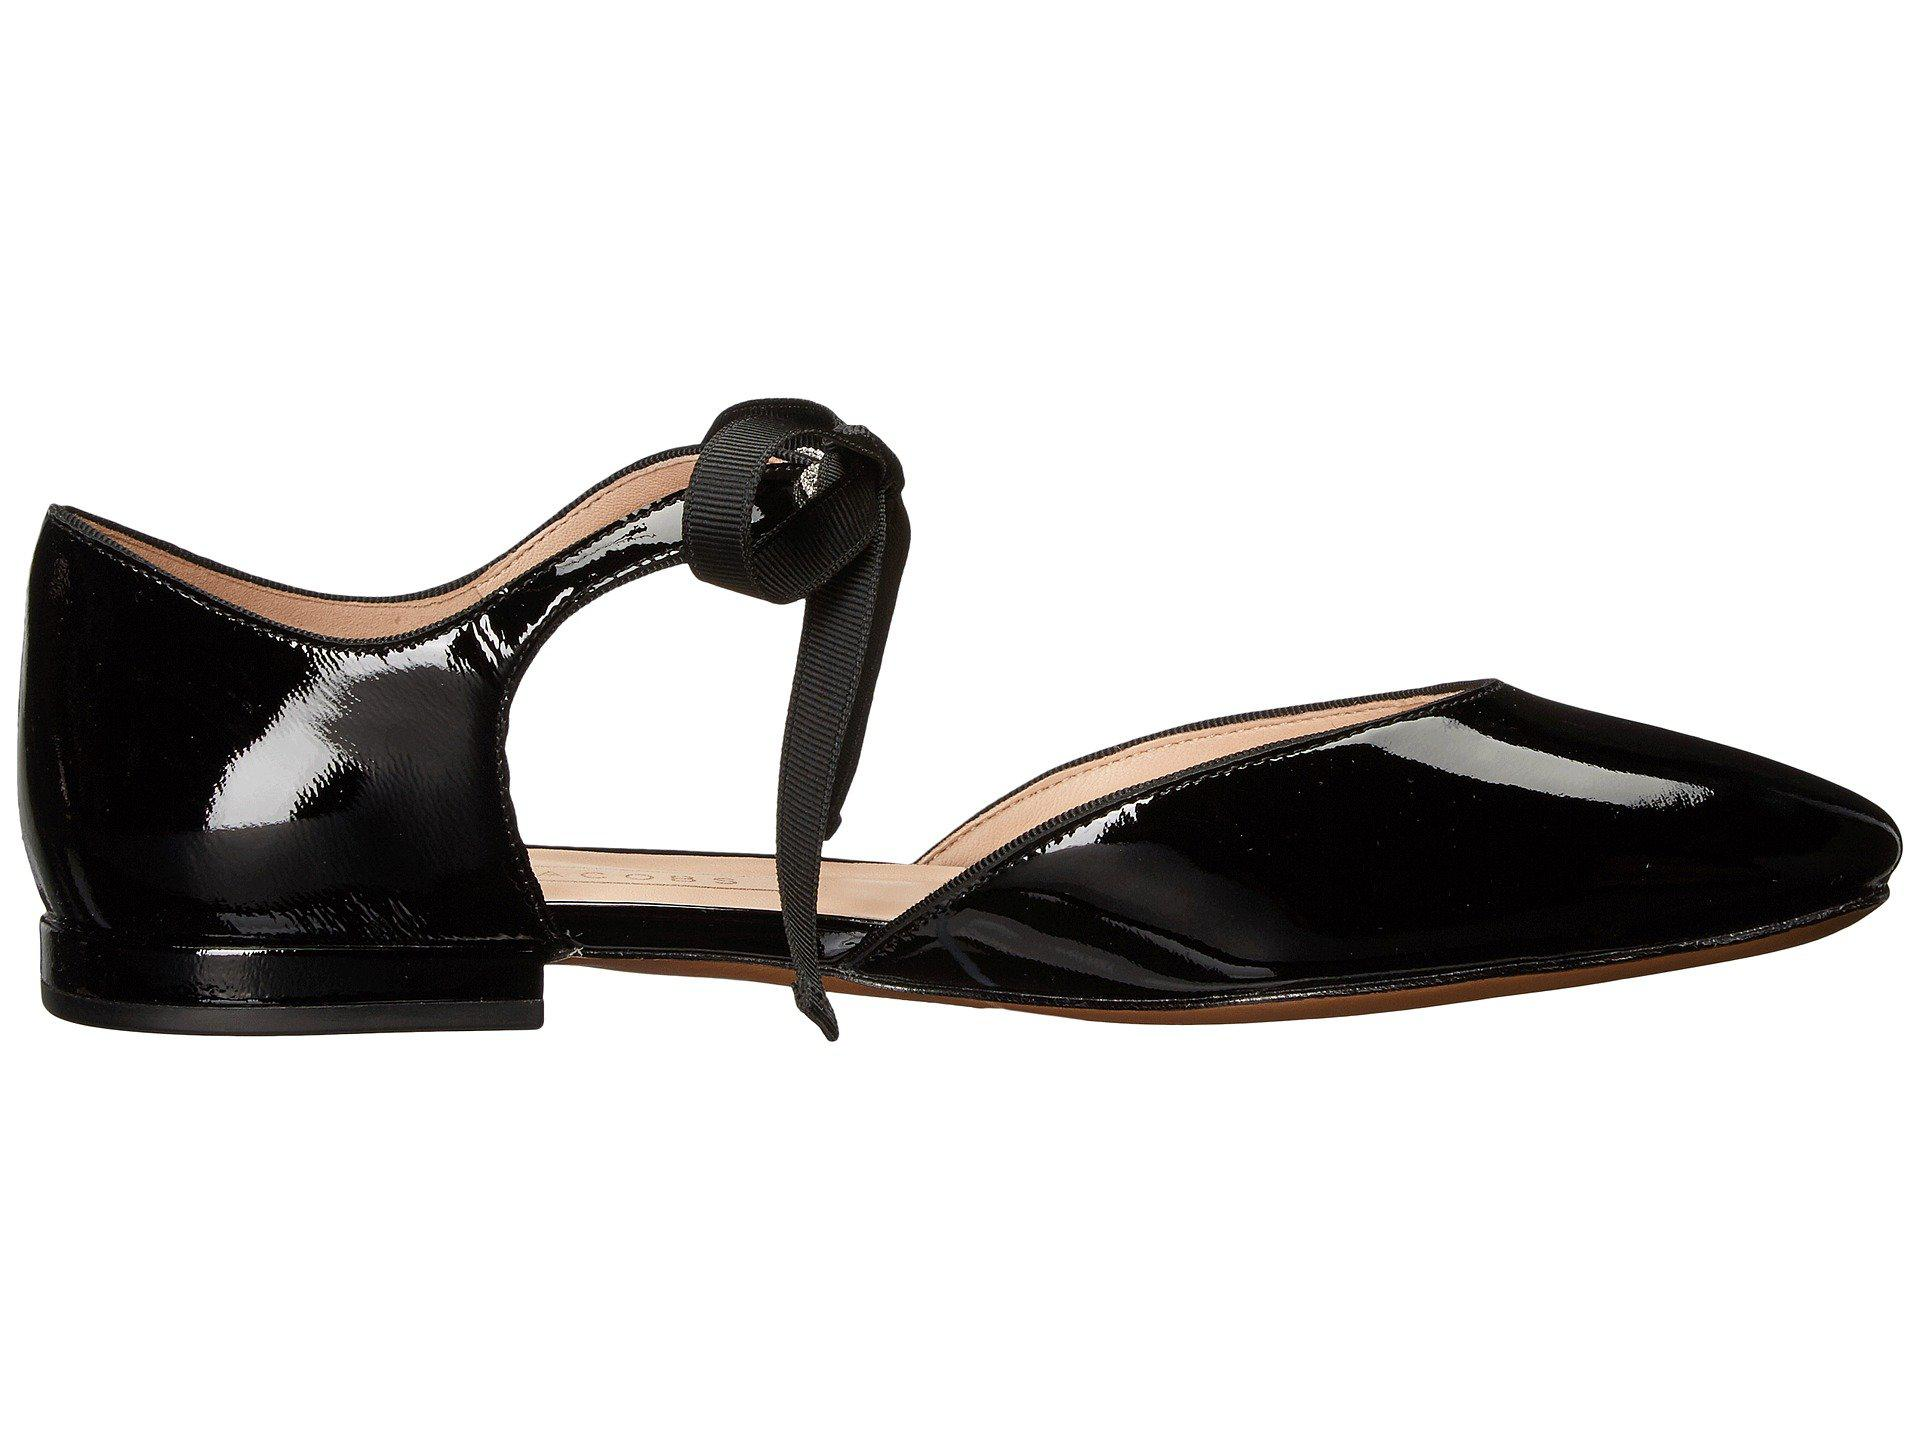 Marc Jacobs Womens Alyssa Mary Jane Ballerina Ballet Flat